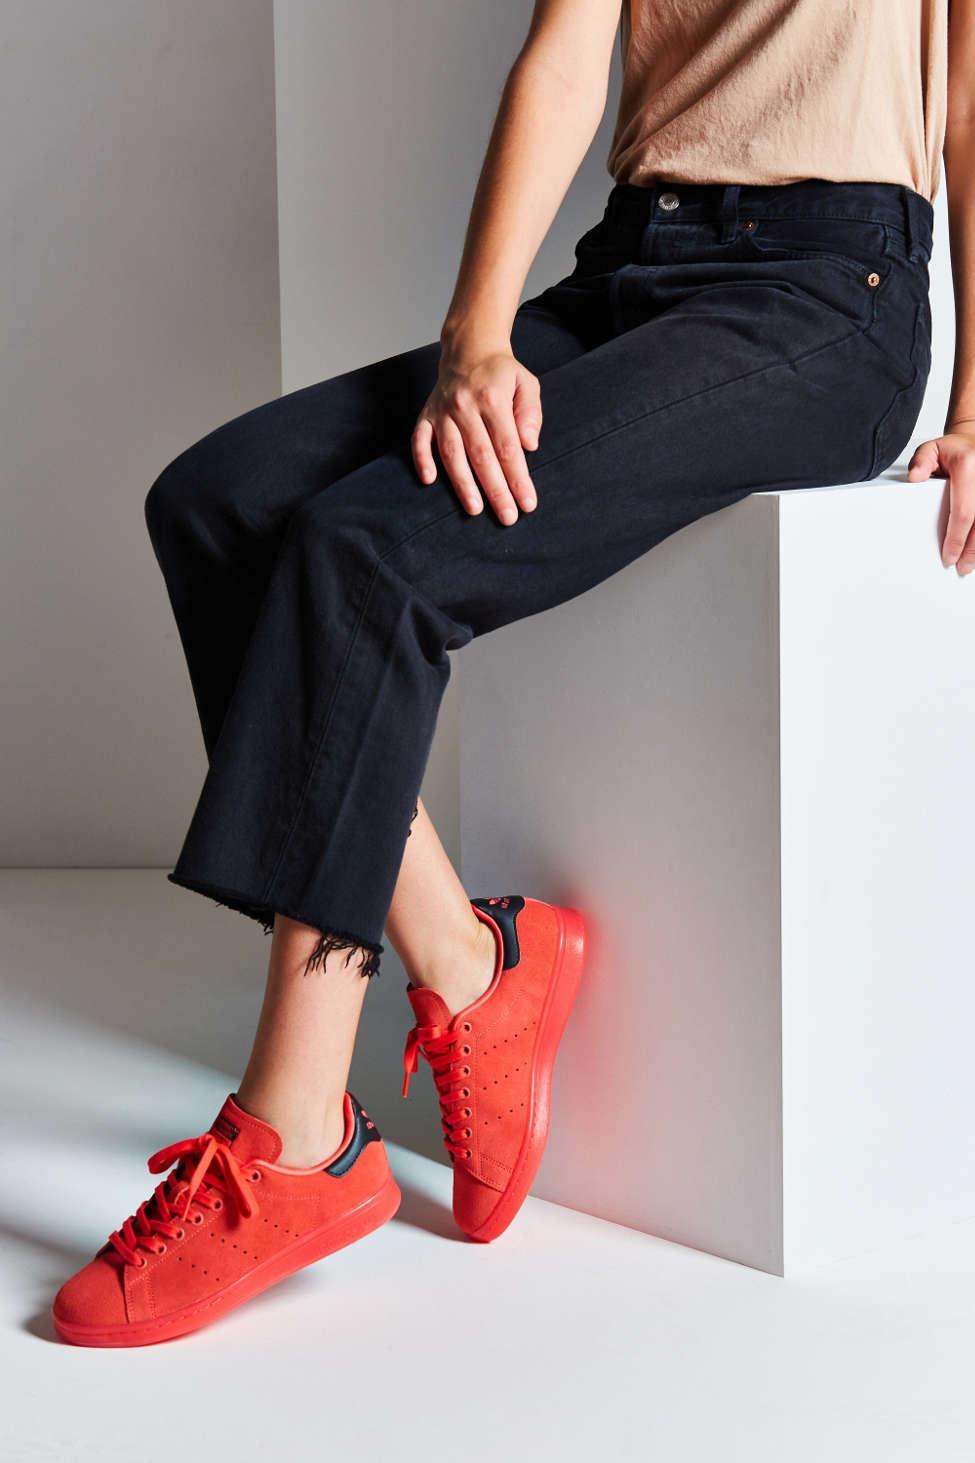 Adidas Ice Stan Smith zapatilla Urban Outfitters Canada